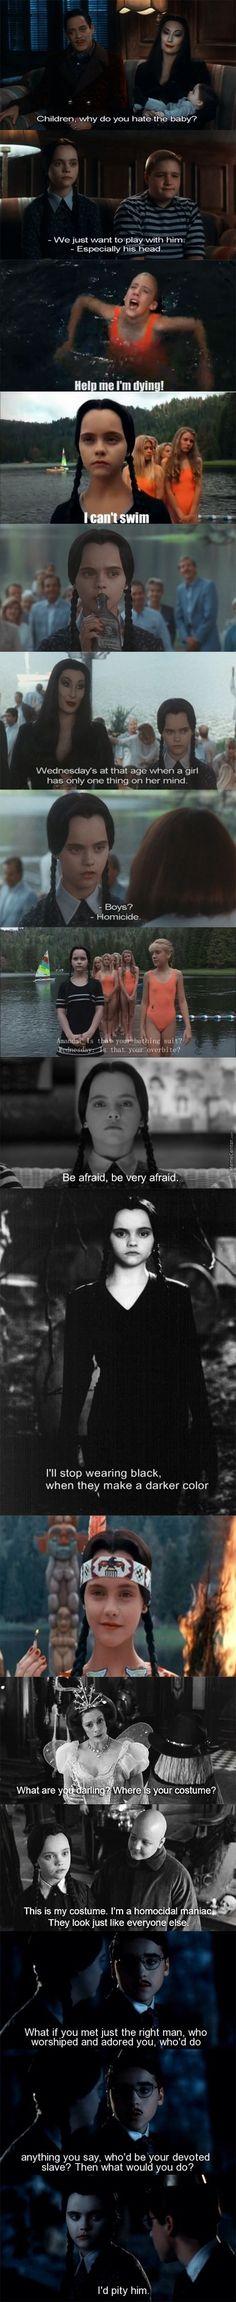 I freaking love Wednesday Addams omg